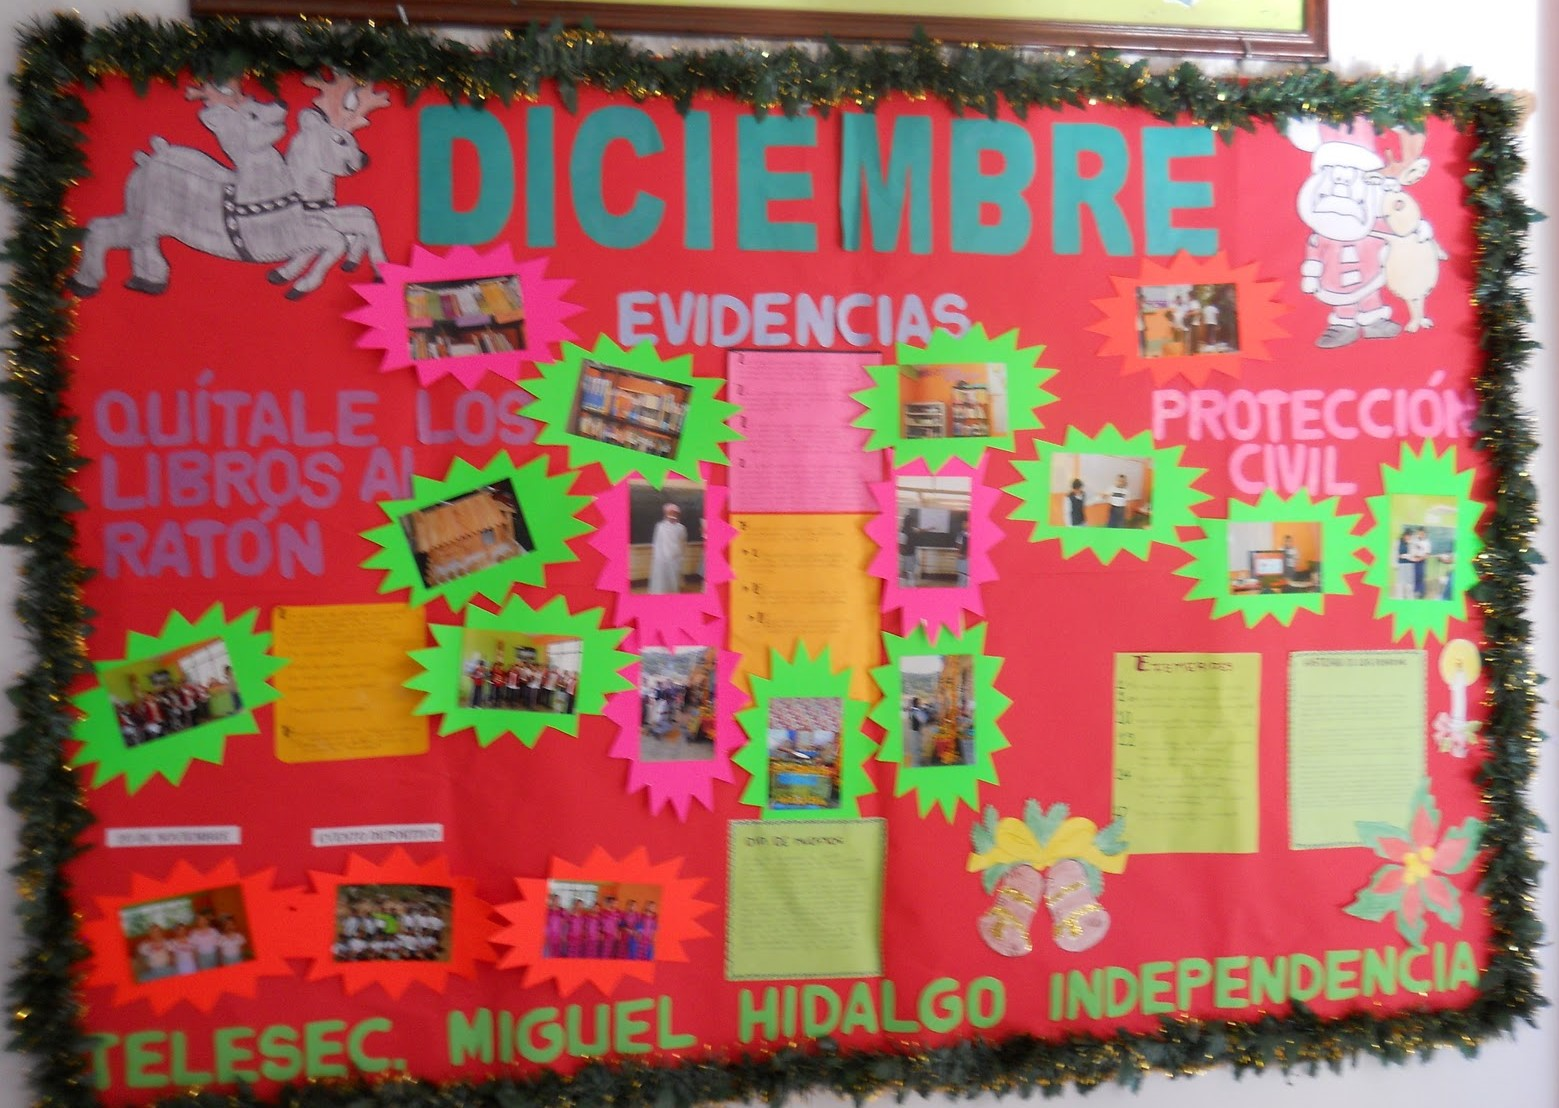 Periodico mural diciembre 6 imagenes educativas for Estructura de un periodico mural